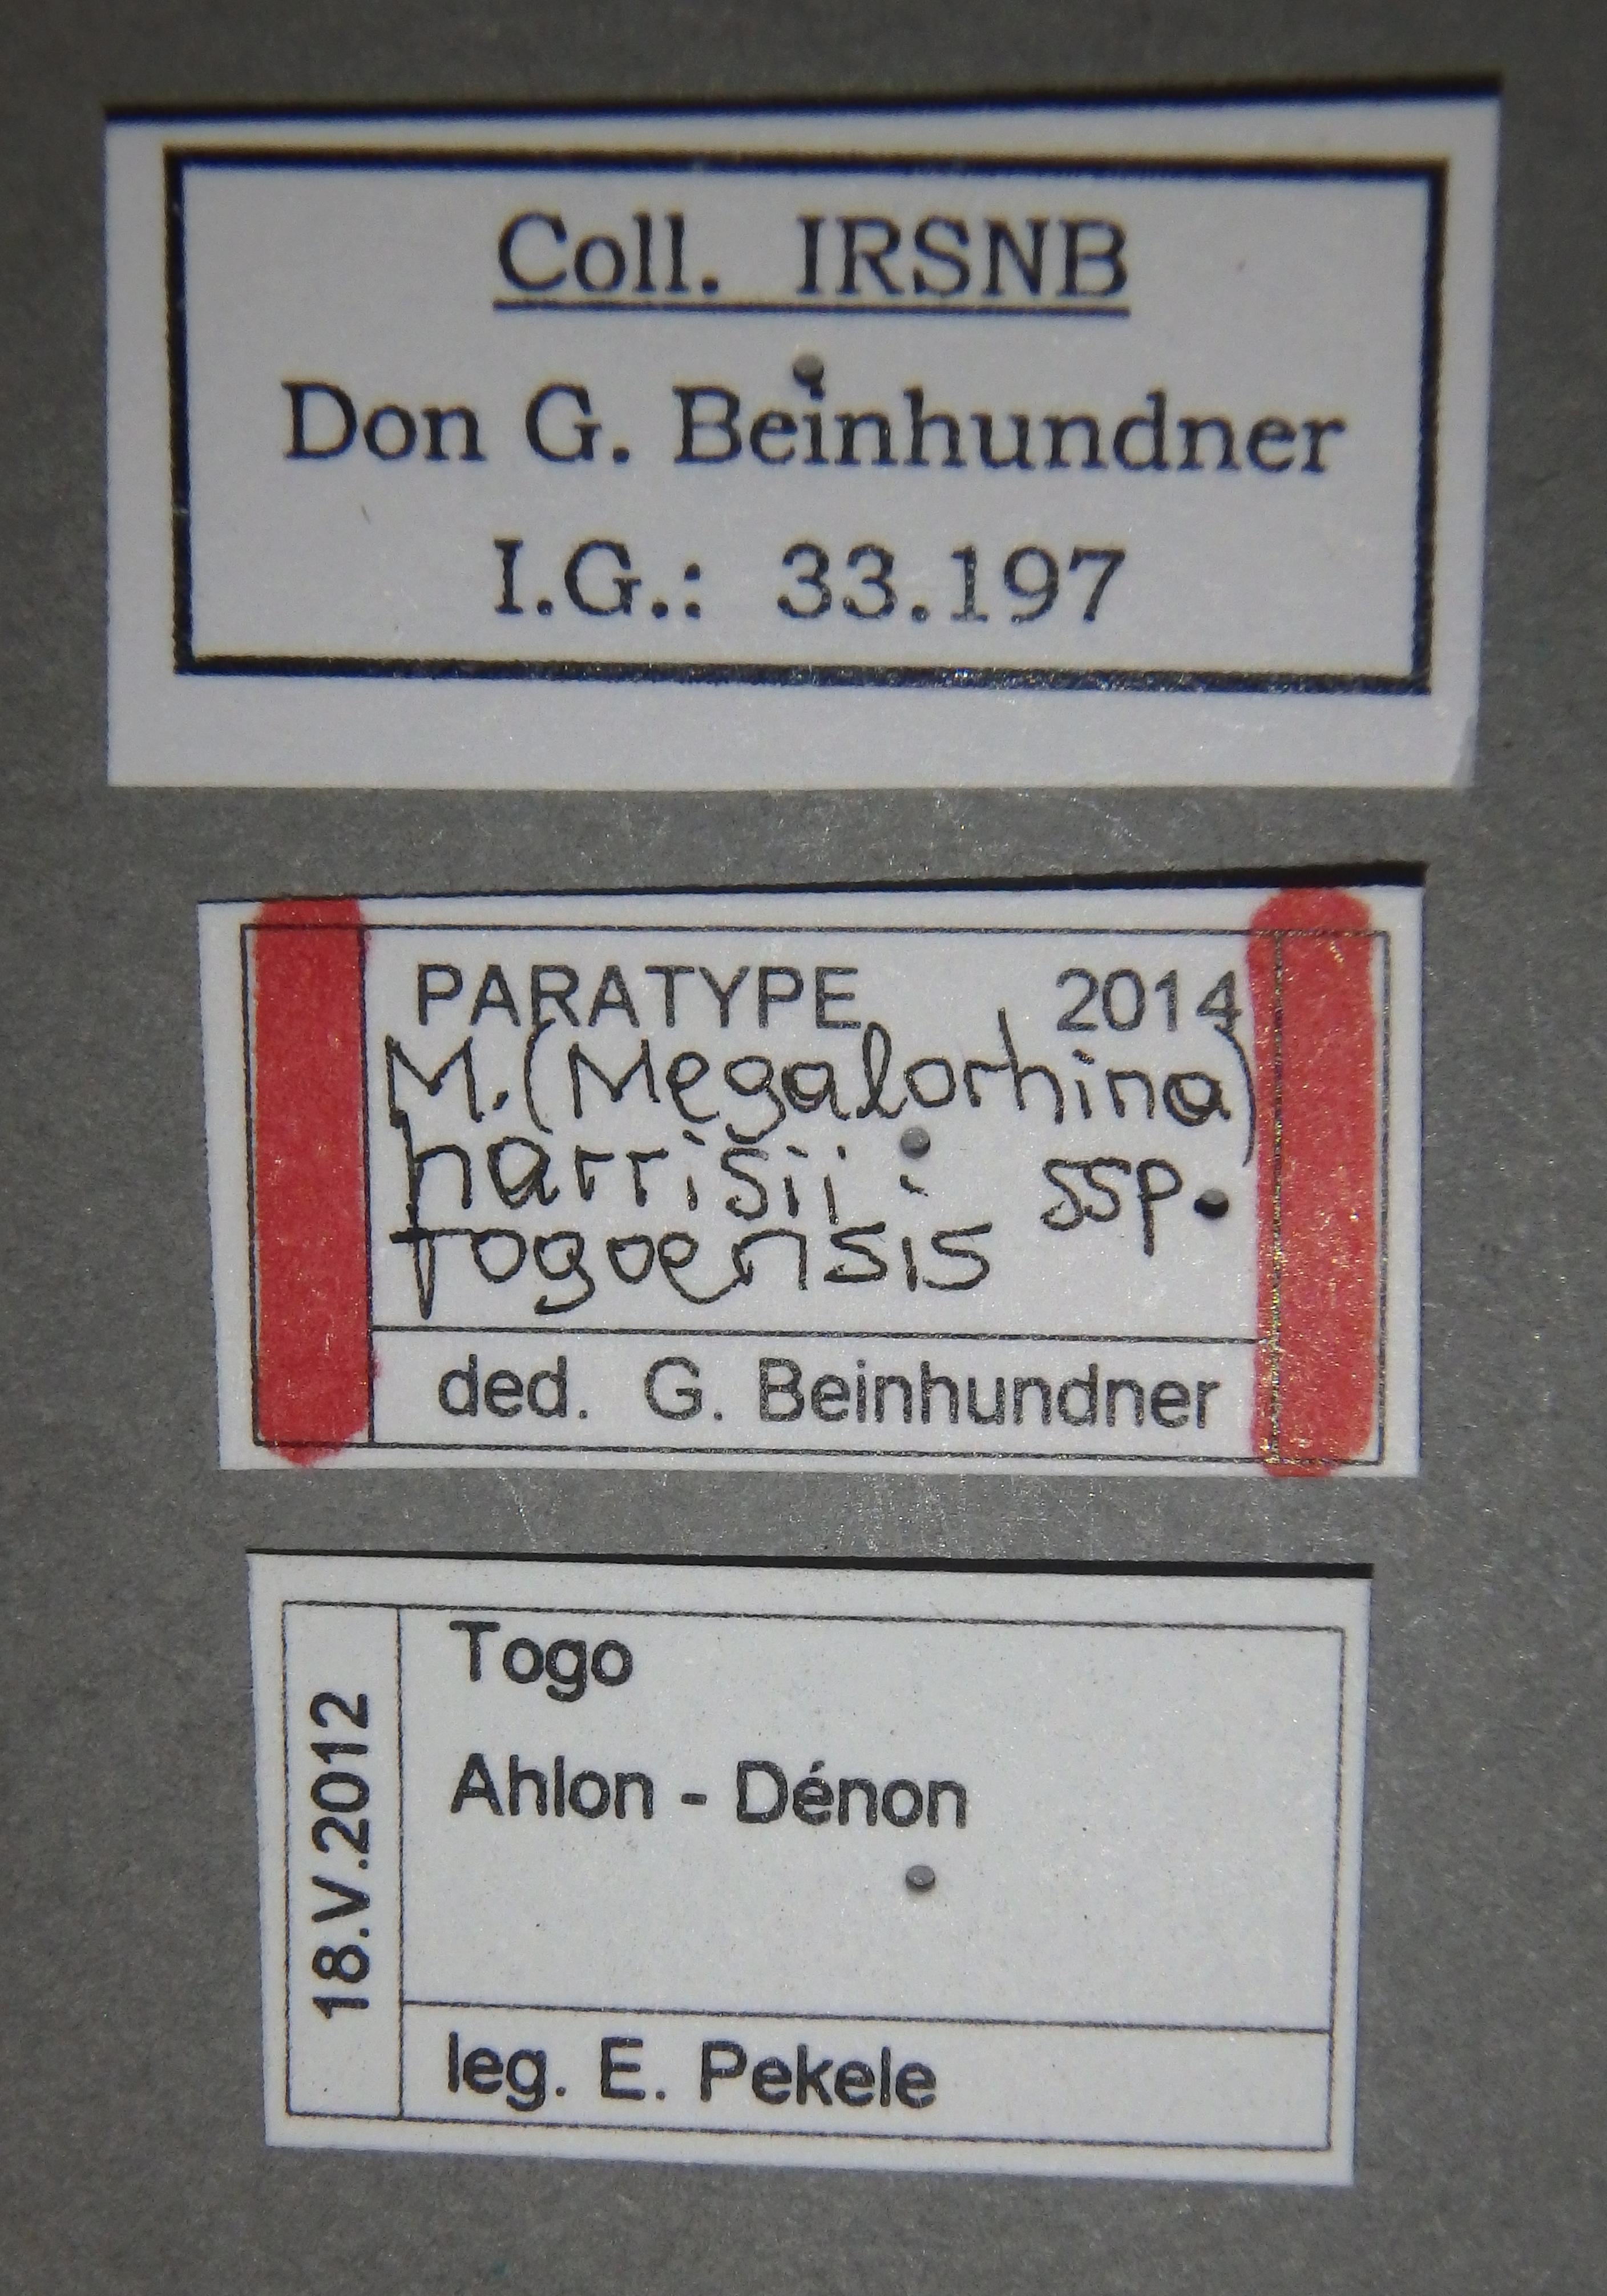 Mecynorhina (Megalorhina) harrisii subspecies togoensis pt1 Lb.JPG